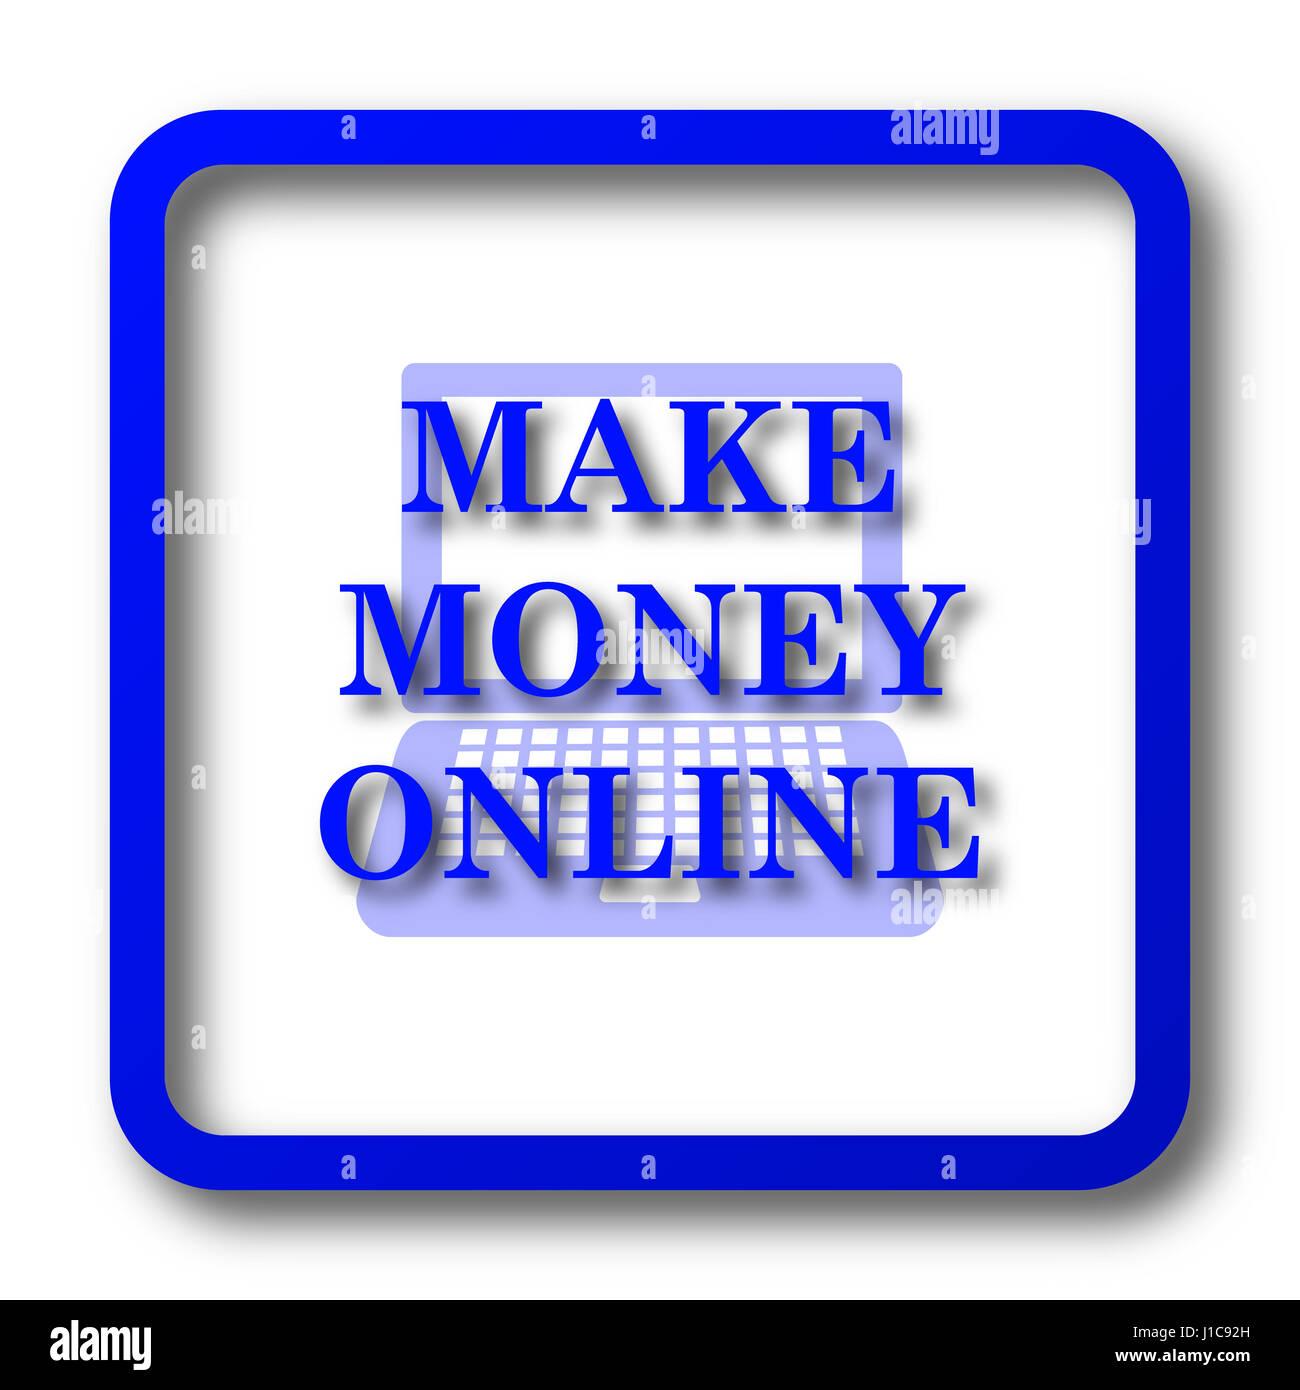 Make Clipart Online - The Best Clipart Desing